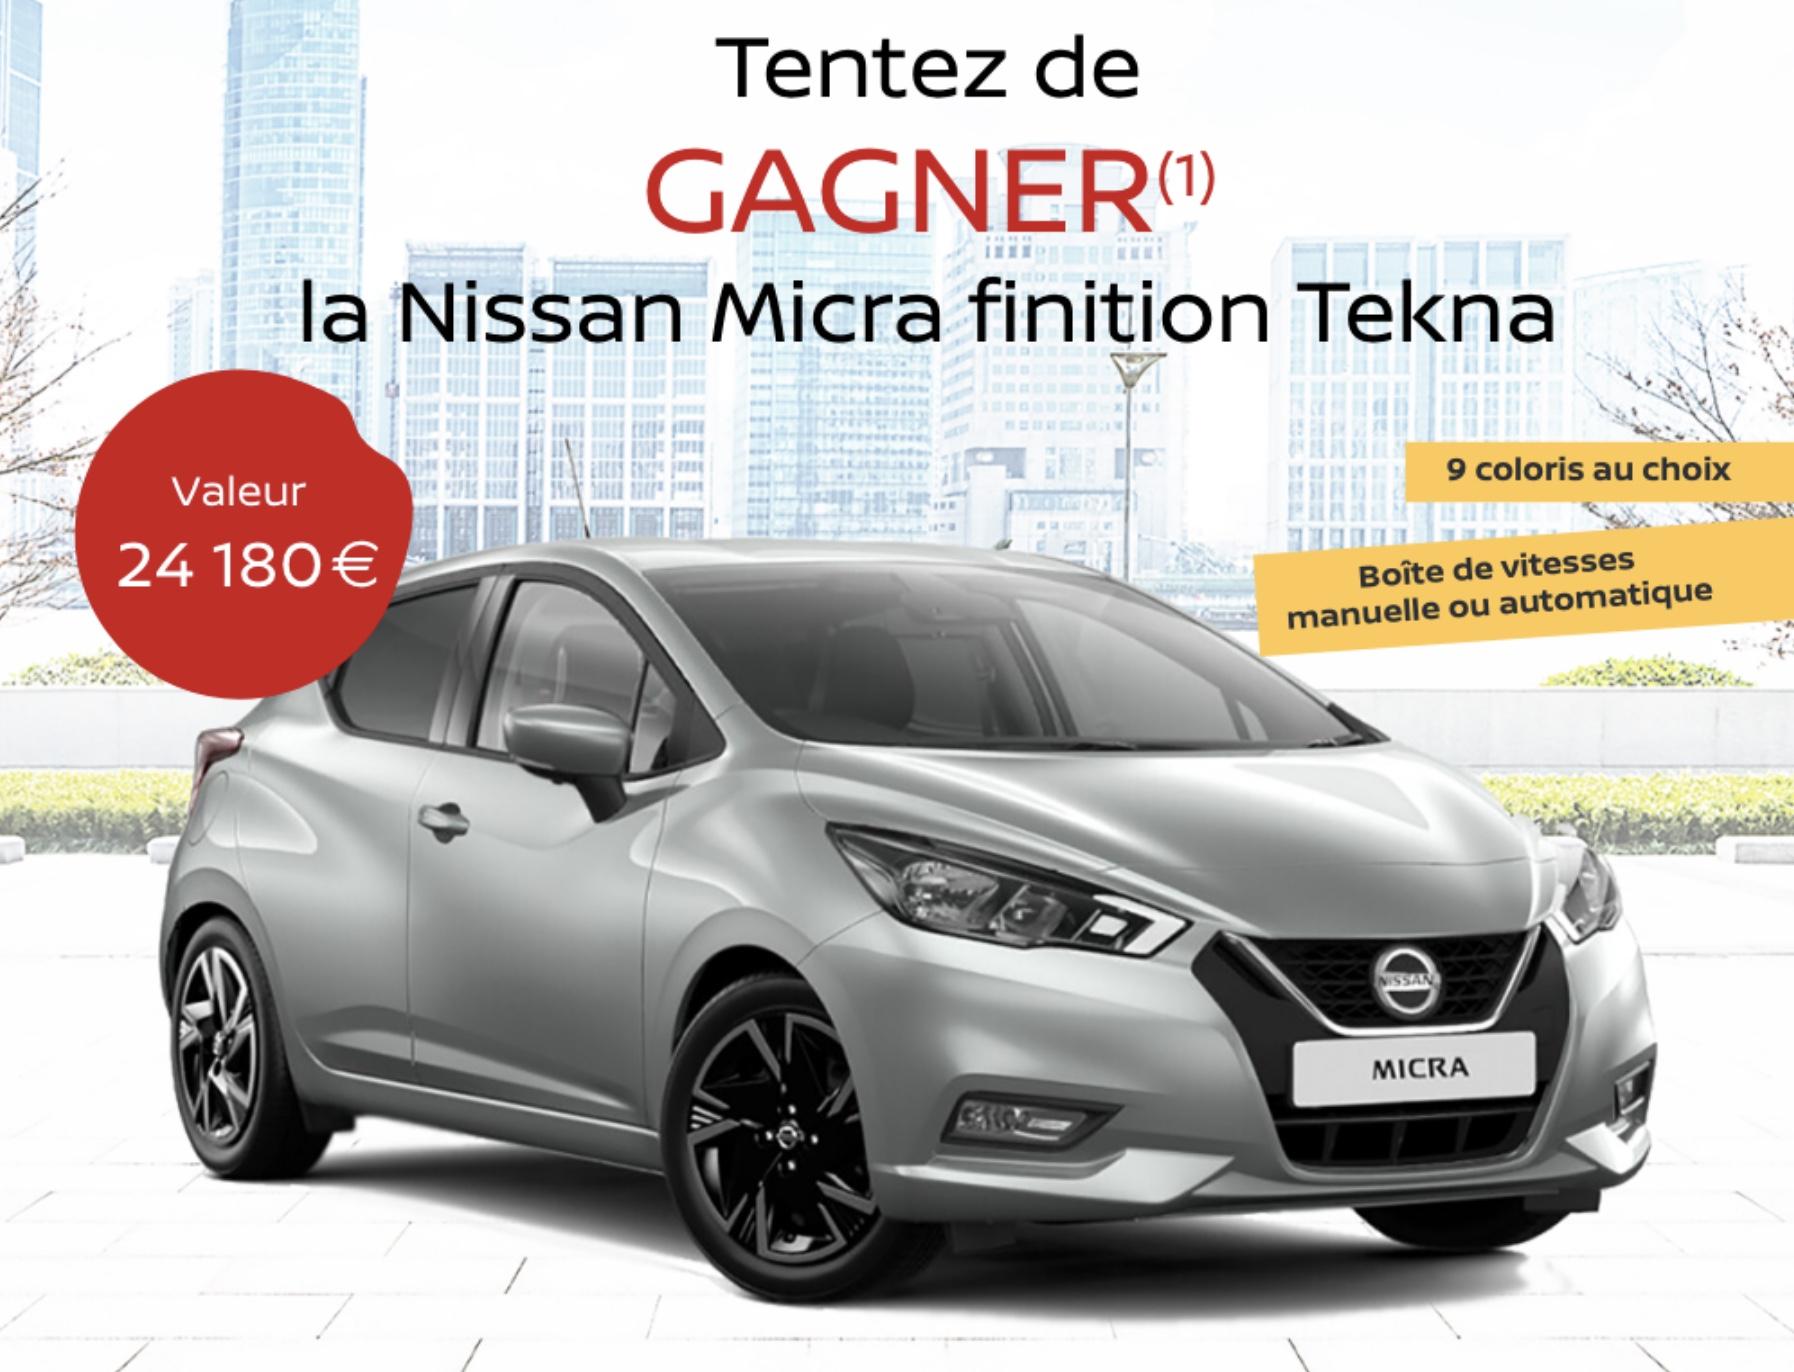 Code promo Blancheporte : 1 voiture Nissan Micra à gagner